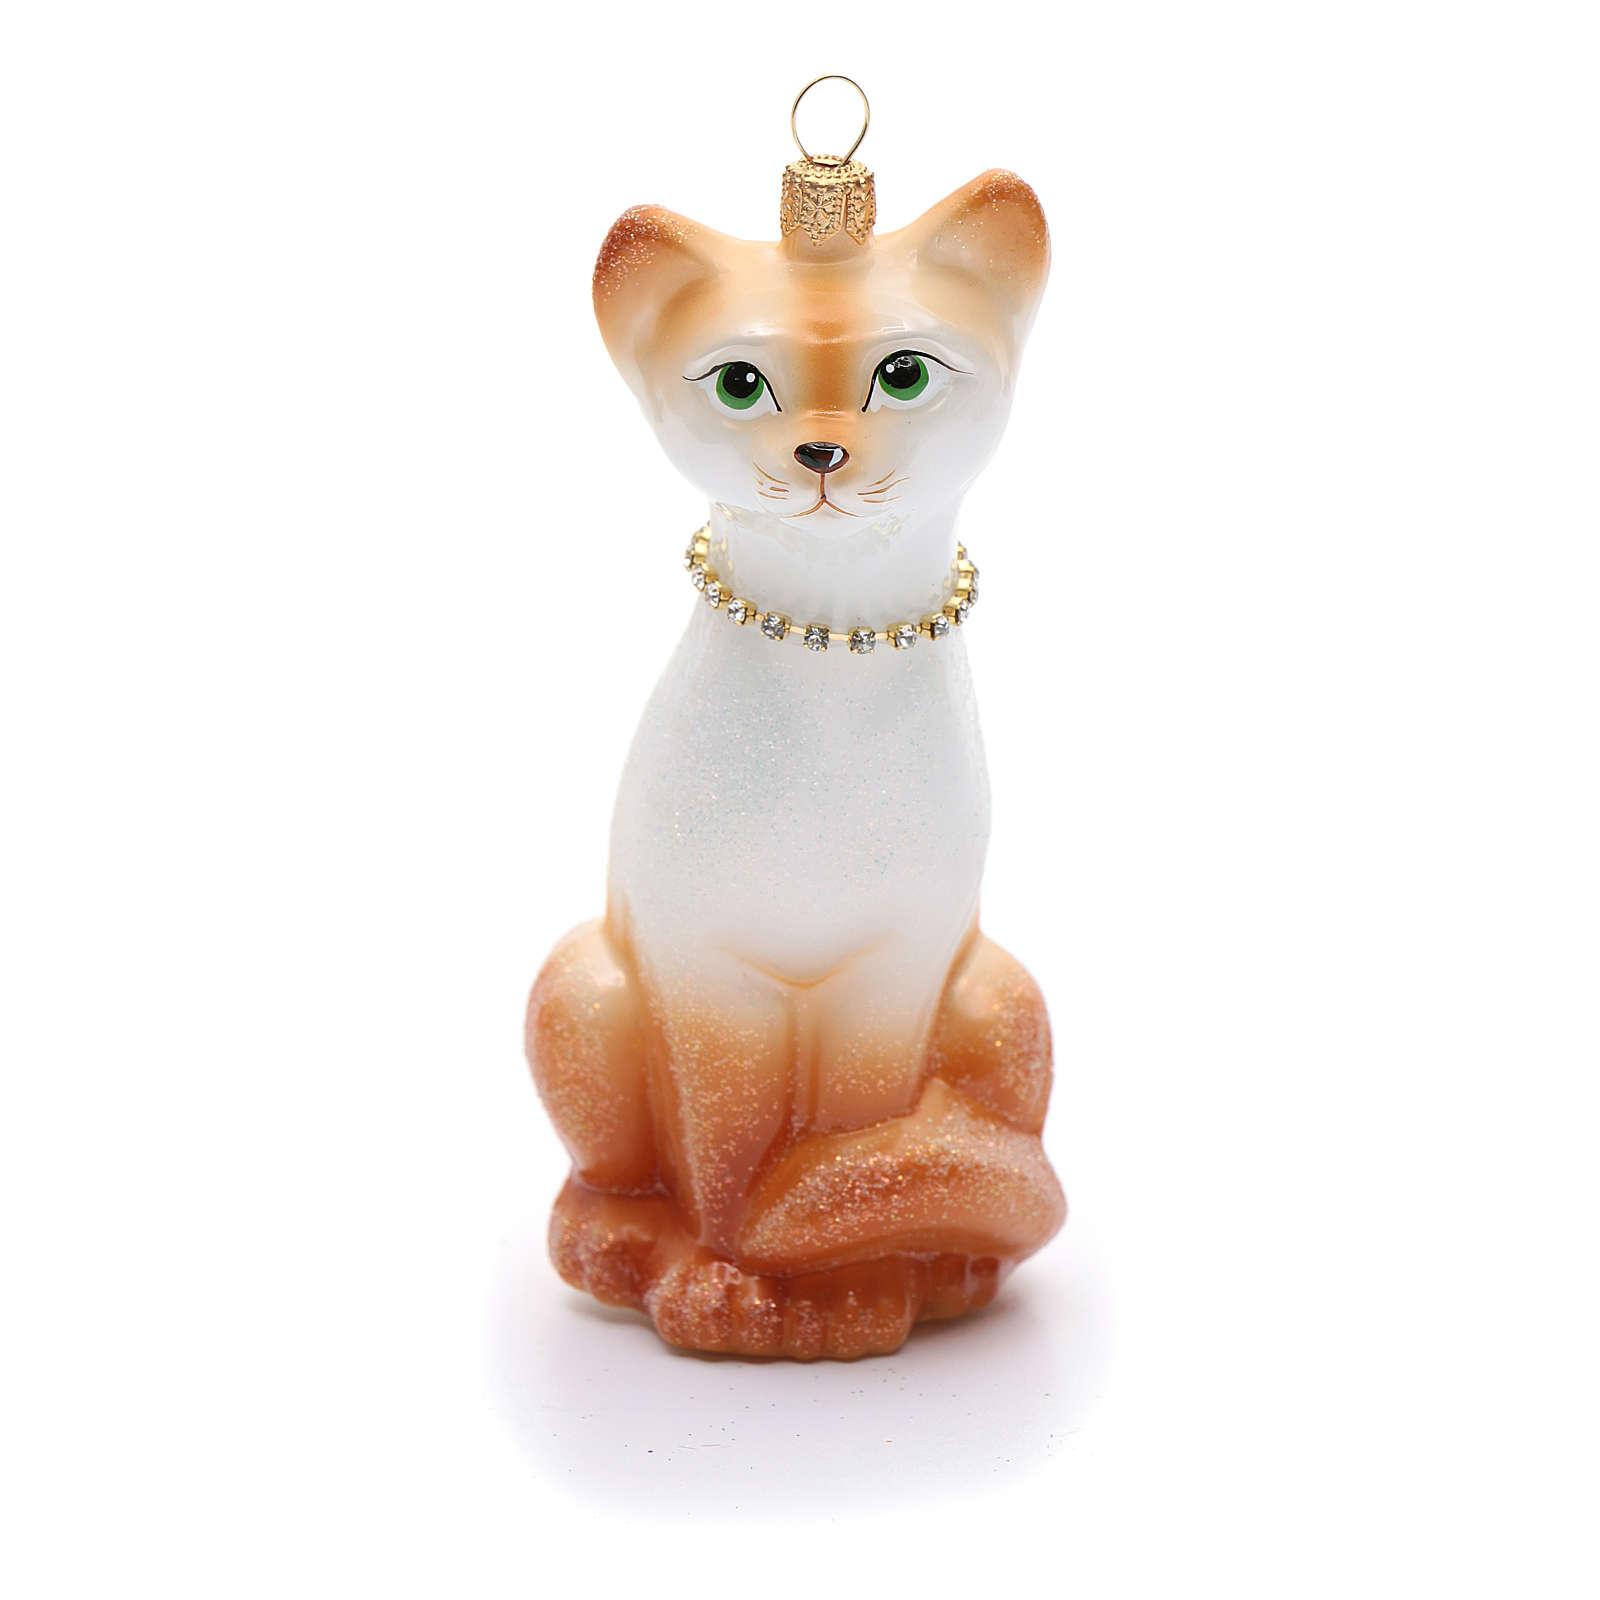 Blown glass Christmas ornament, oriental shorthair cat 4